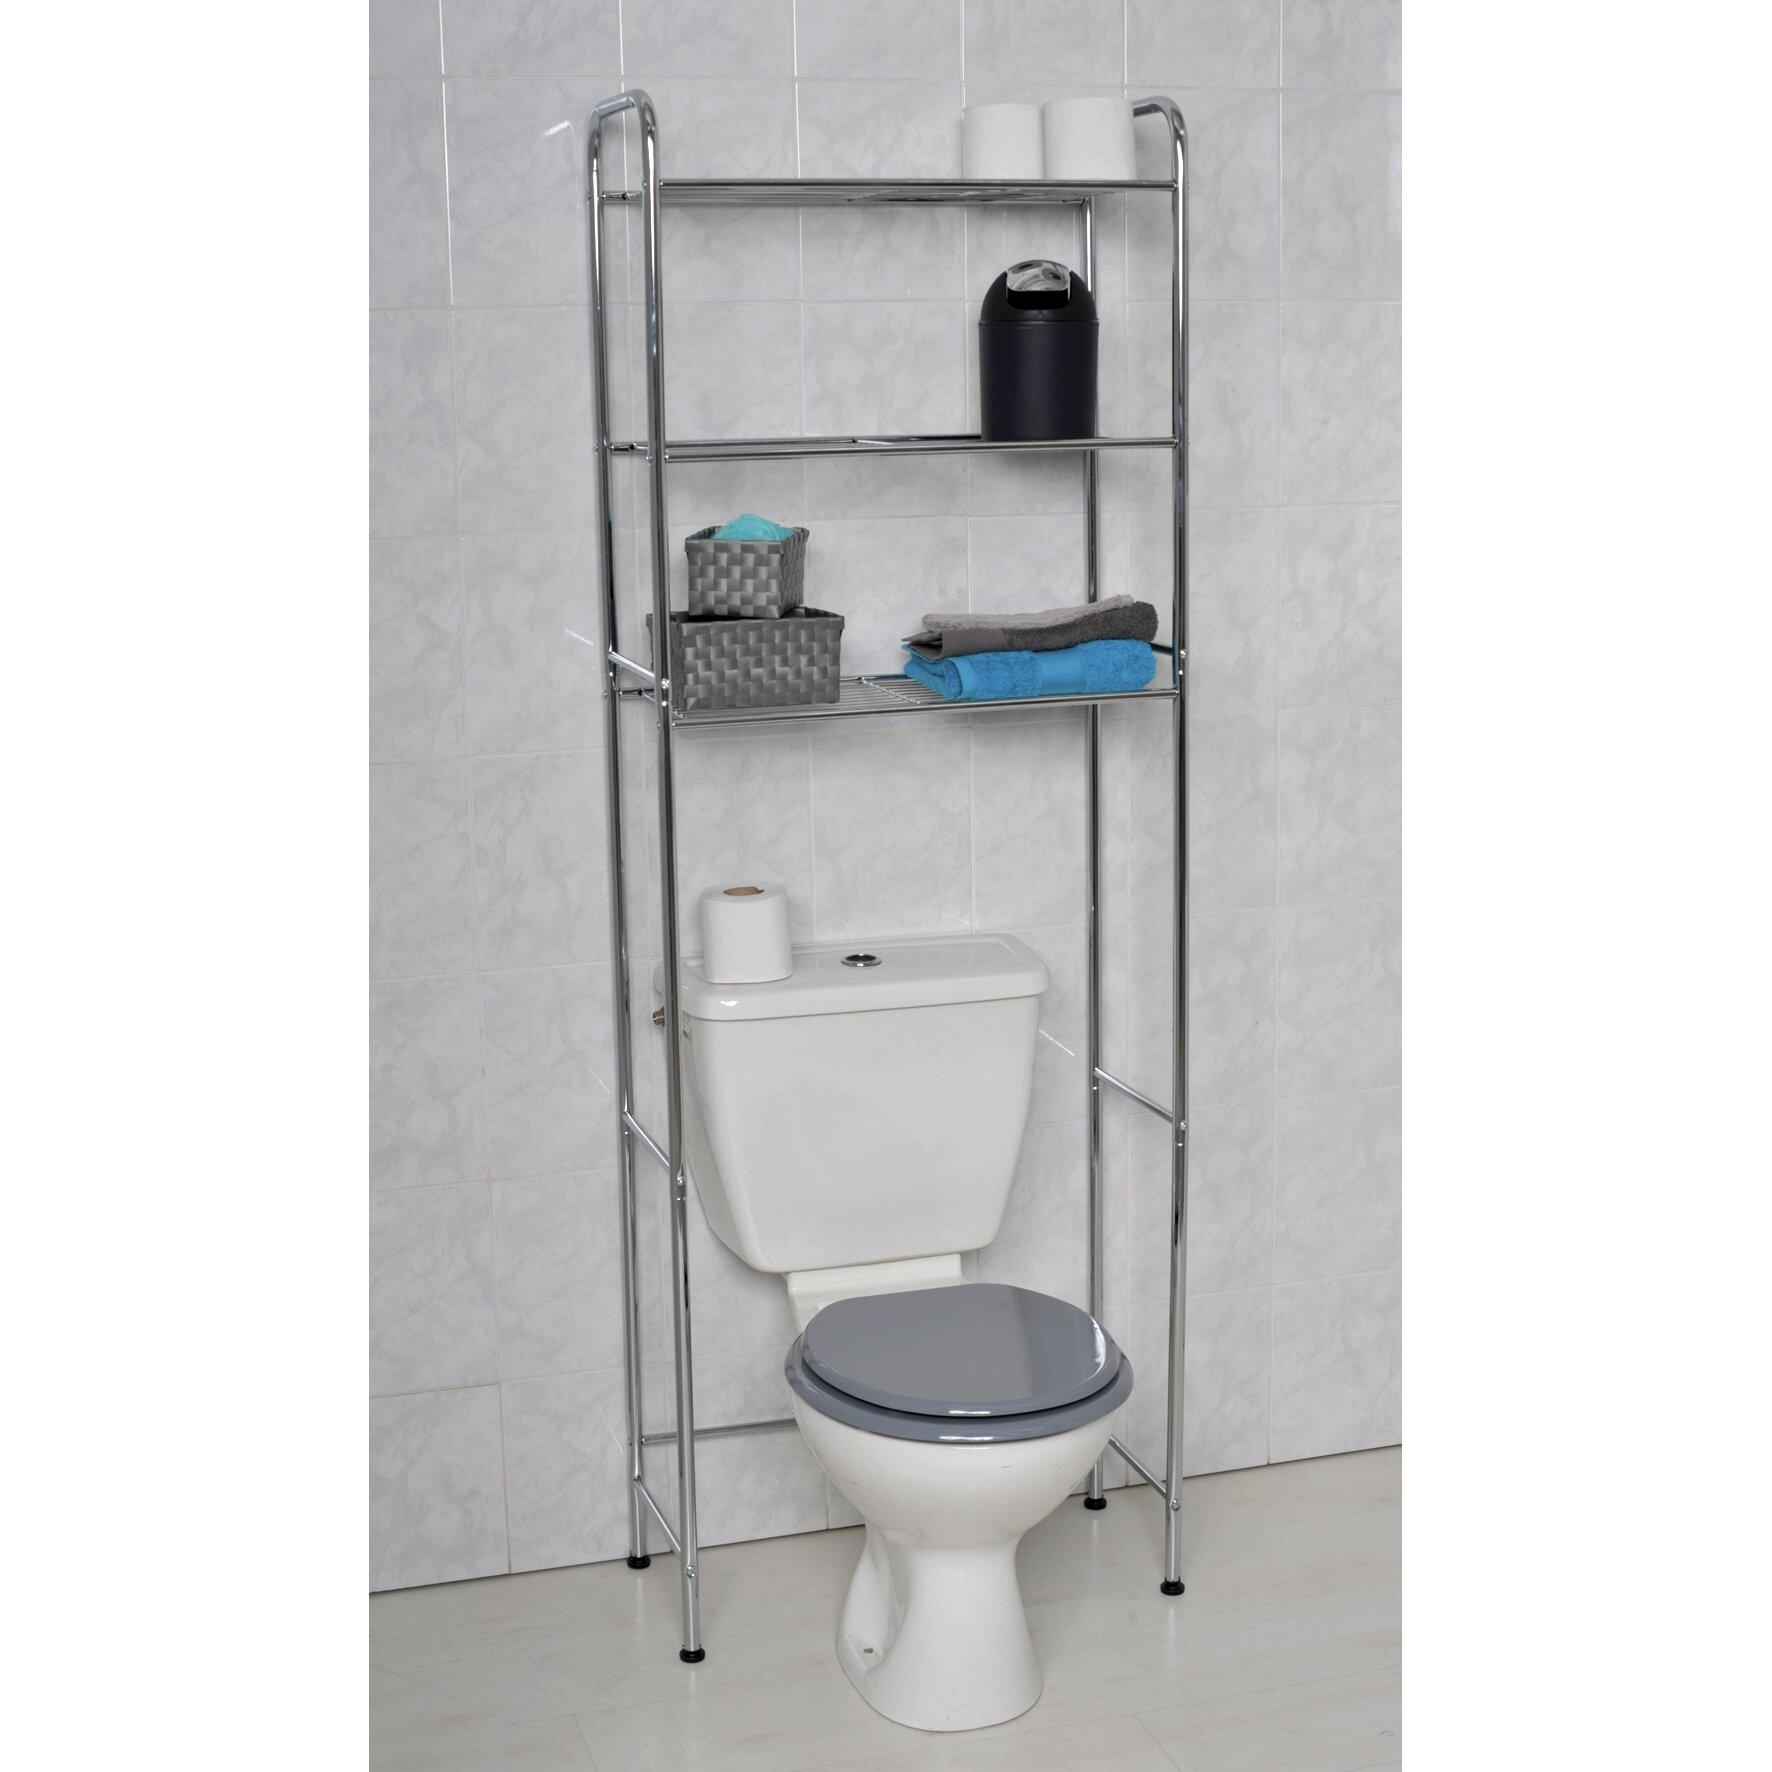 Wrought iron bathroom space saver - Bathroom Space Saver Bathroom Spacesaver Metal Three Tiers Wire Bathroom Space Saver Black Enwe Us